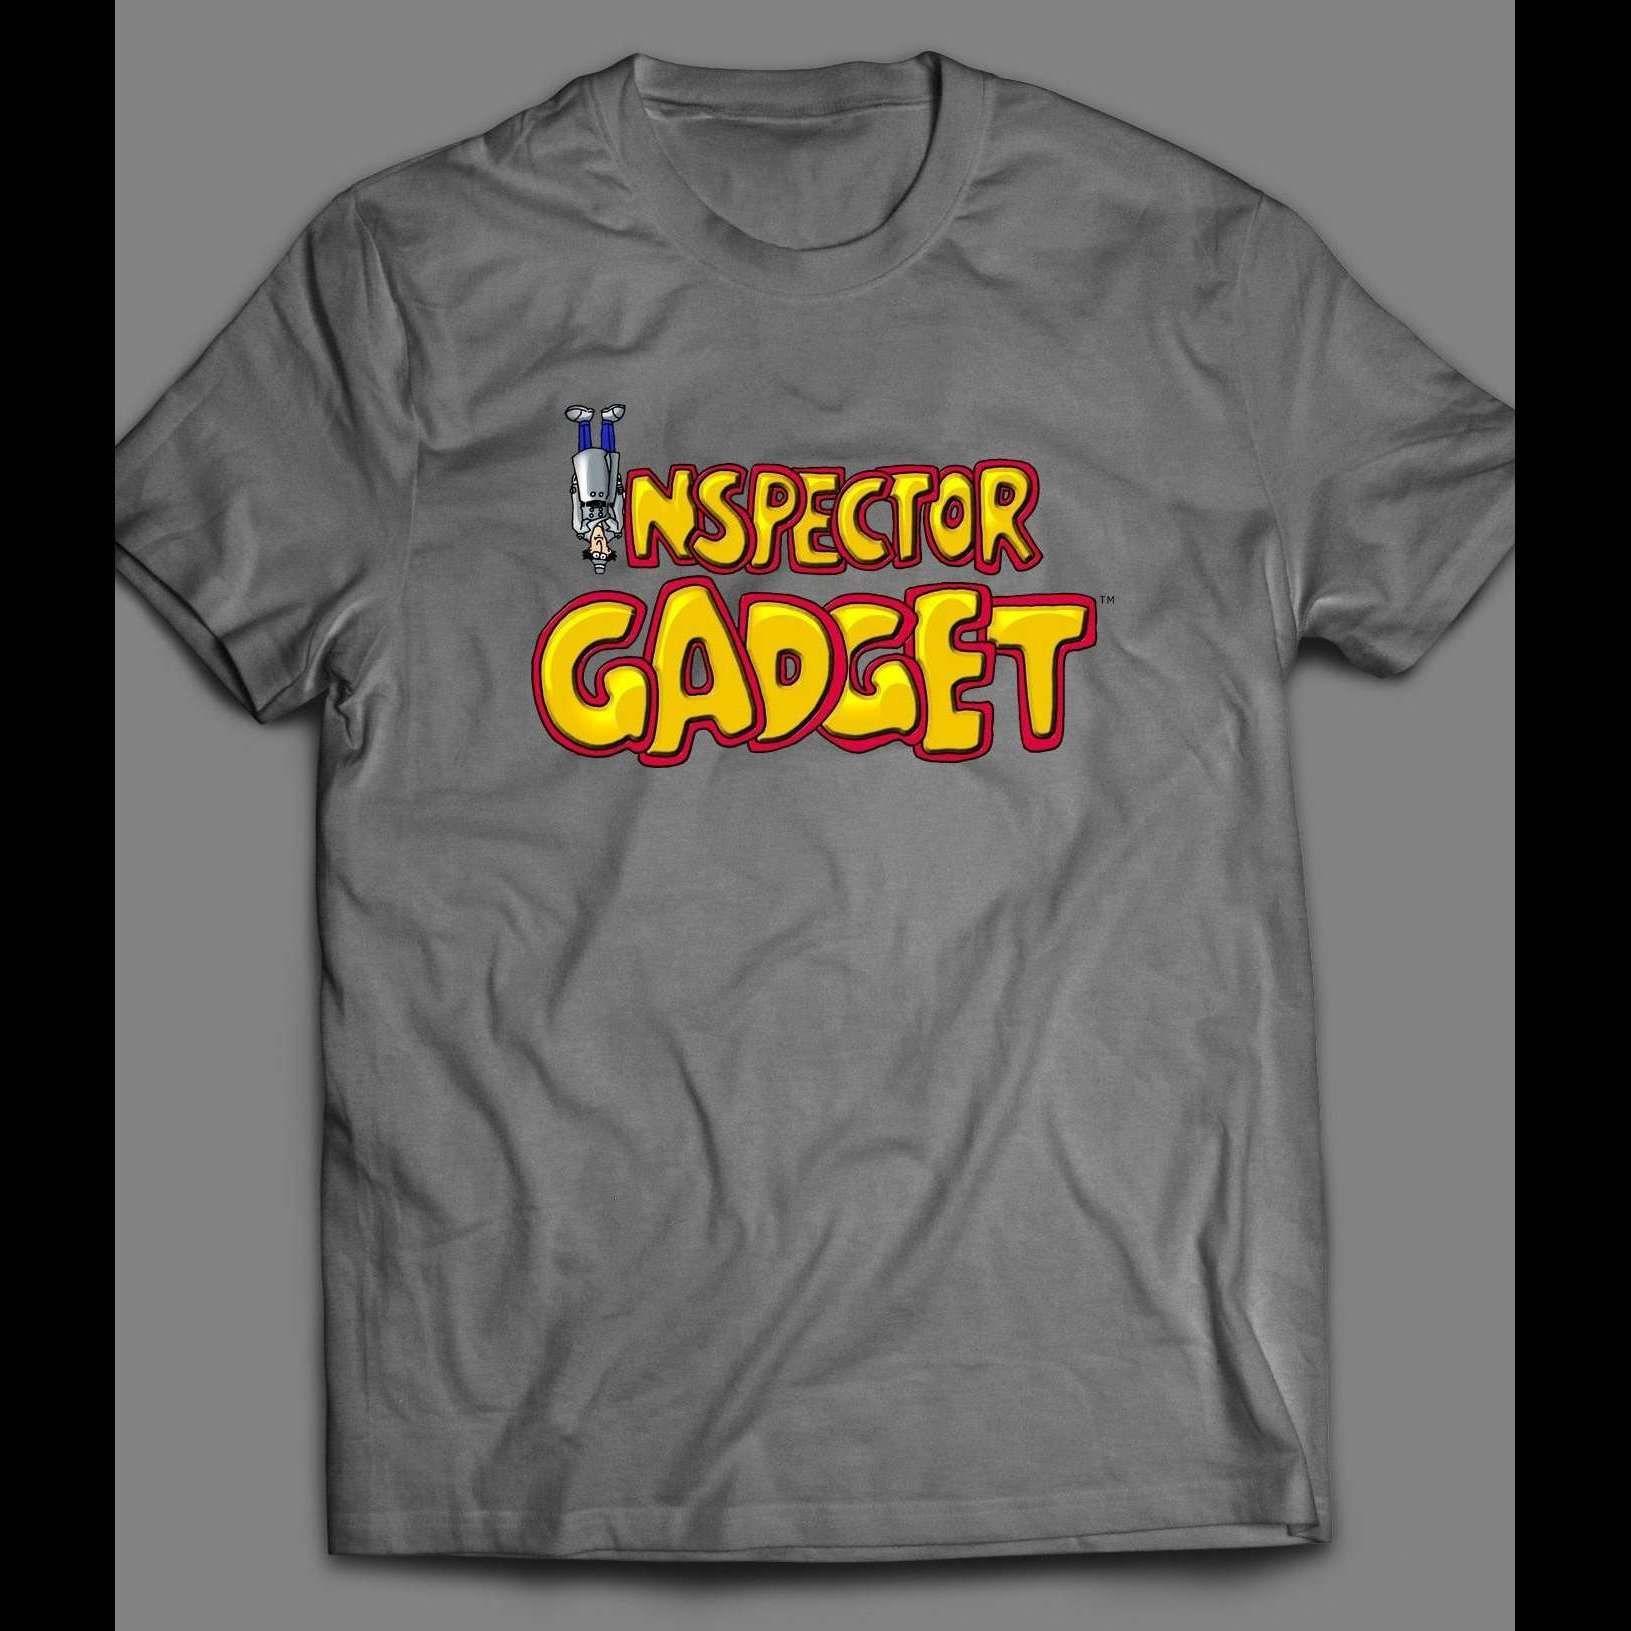 INSPECTOR GADGET UPSIDE DOWN VINTAGE SHIRT - LARGE / GRAY / Gildan G200 (Included)